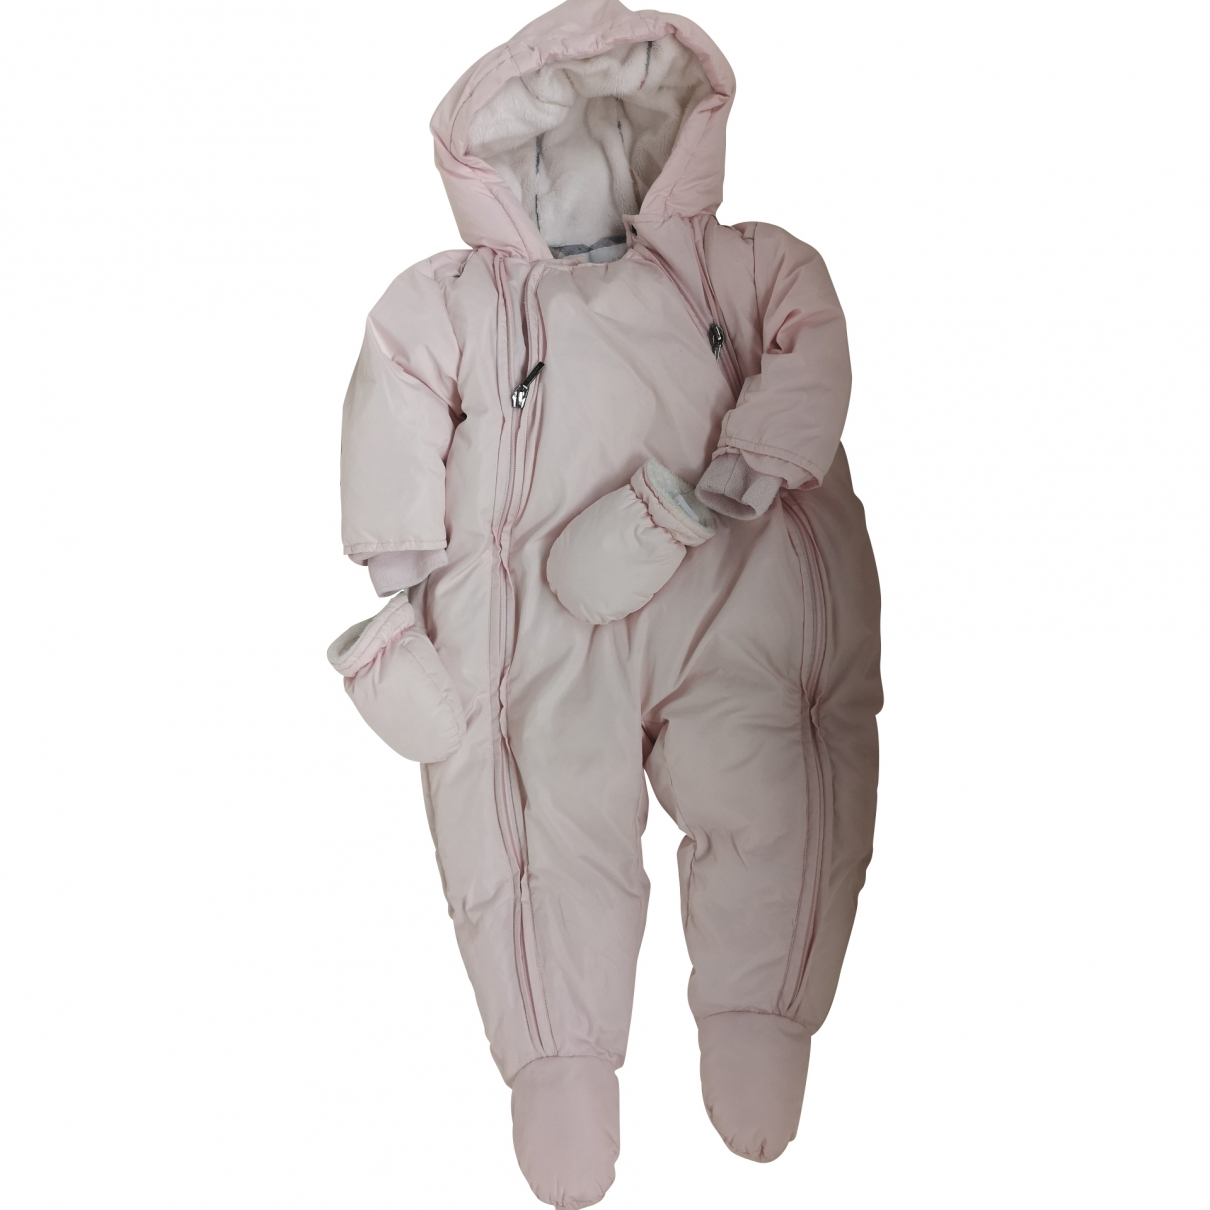 Burberry \N Pink jacket & coat for Kids 12 months - up to 74cm FR